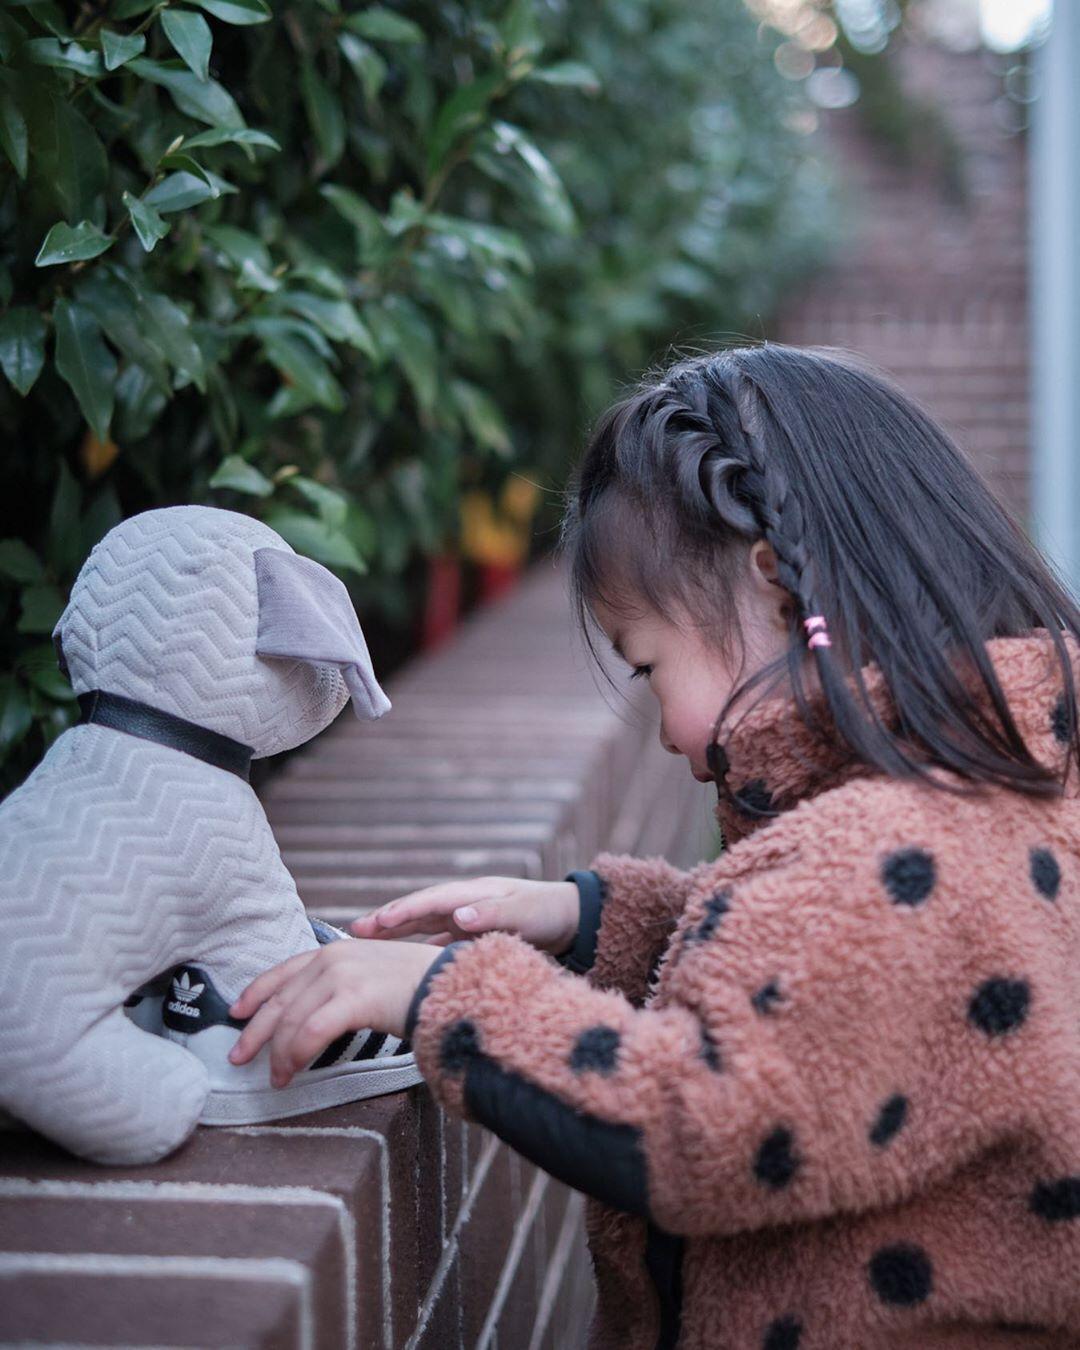 "The true sign of intelligence is not knowledge but IMAGINATION ."" Albert Einstein . . . . . . . . . #myfujilove #XT3 #fujinon #fujifilmxt3 #fujifilm #35mmf14 #fujifilm_global #fujixaus #fujifilmx_au #fujifilm_Xseries #fujifilm_id #kidsportraits #kidsphotoshoot #kidsphotography #familyday #kids #fuji_xseries #fujixlovers #fujifilmphotography #fujinon35mm #fujiphoto"